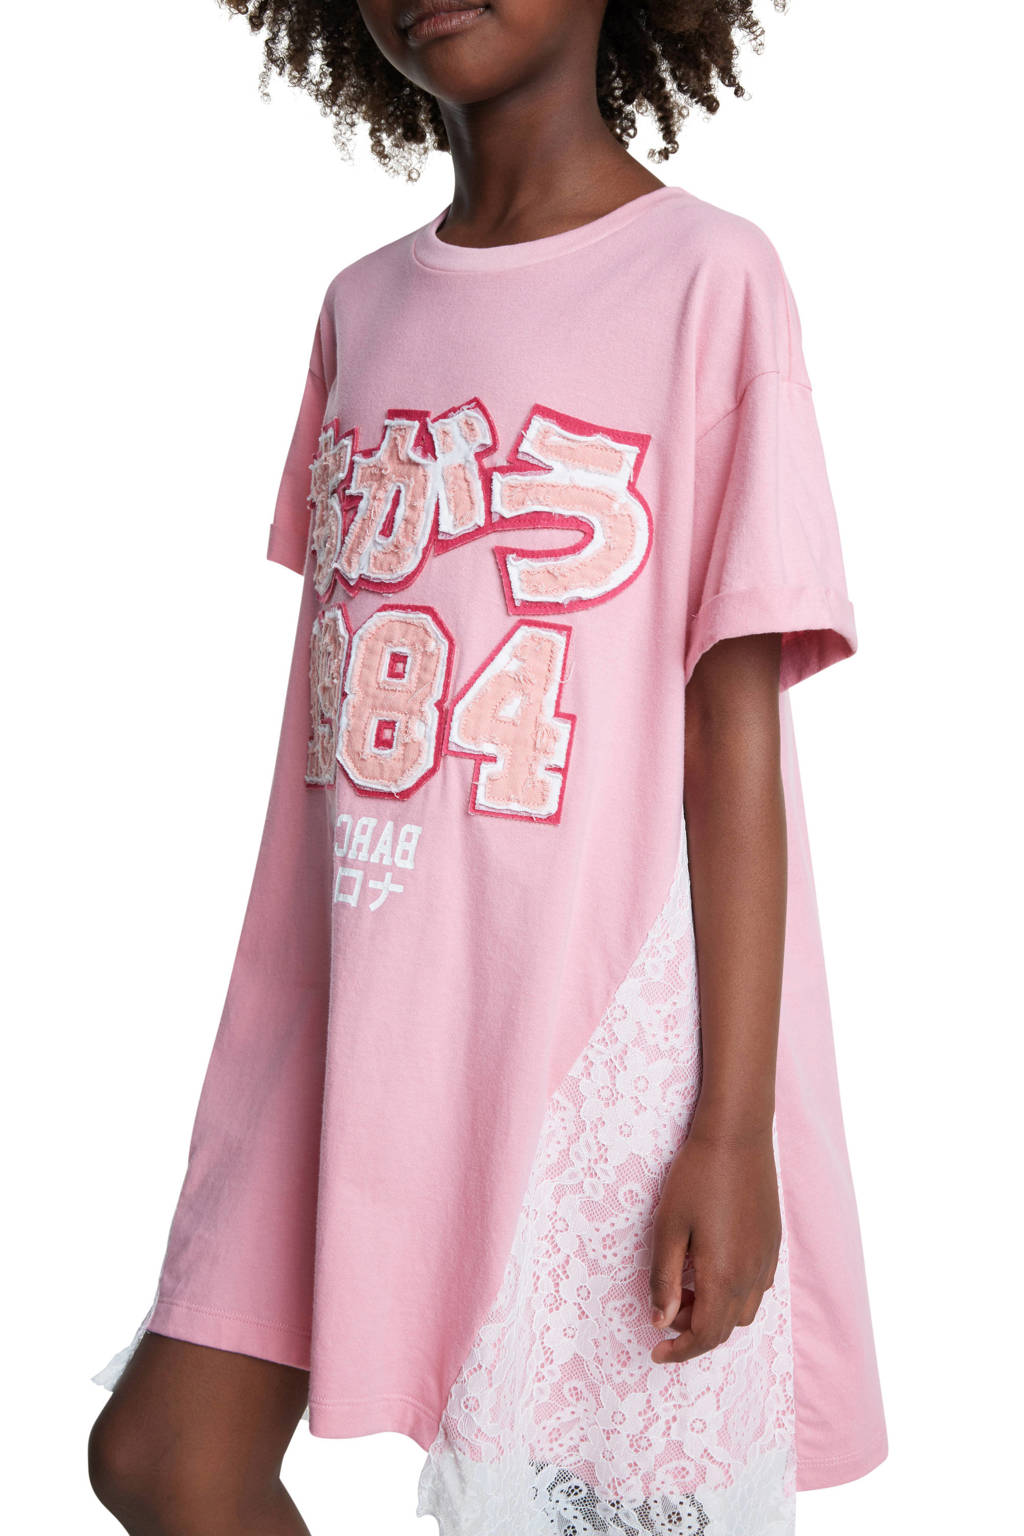 Desigual T-shirtjurk met tekst en kant lichtroze/wit/fuchsia, Lichtroze/wit/fuchsia